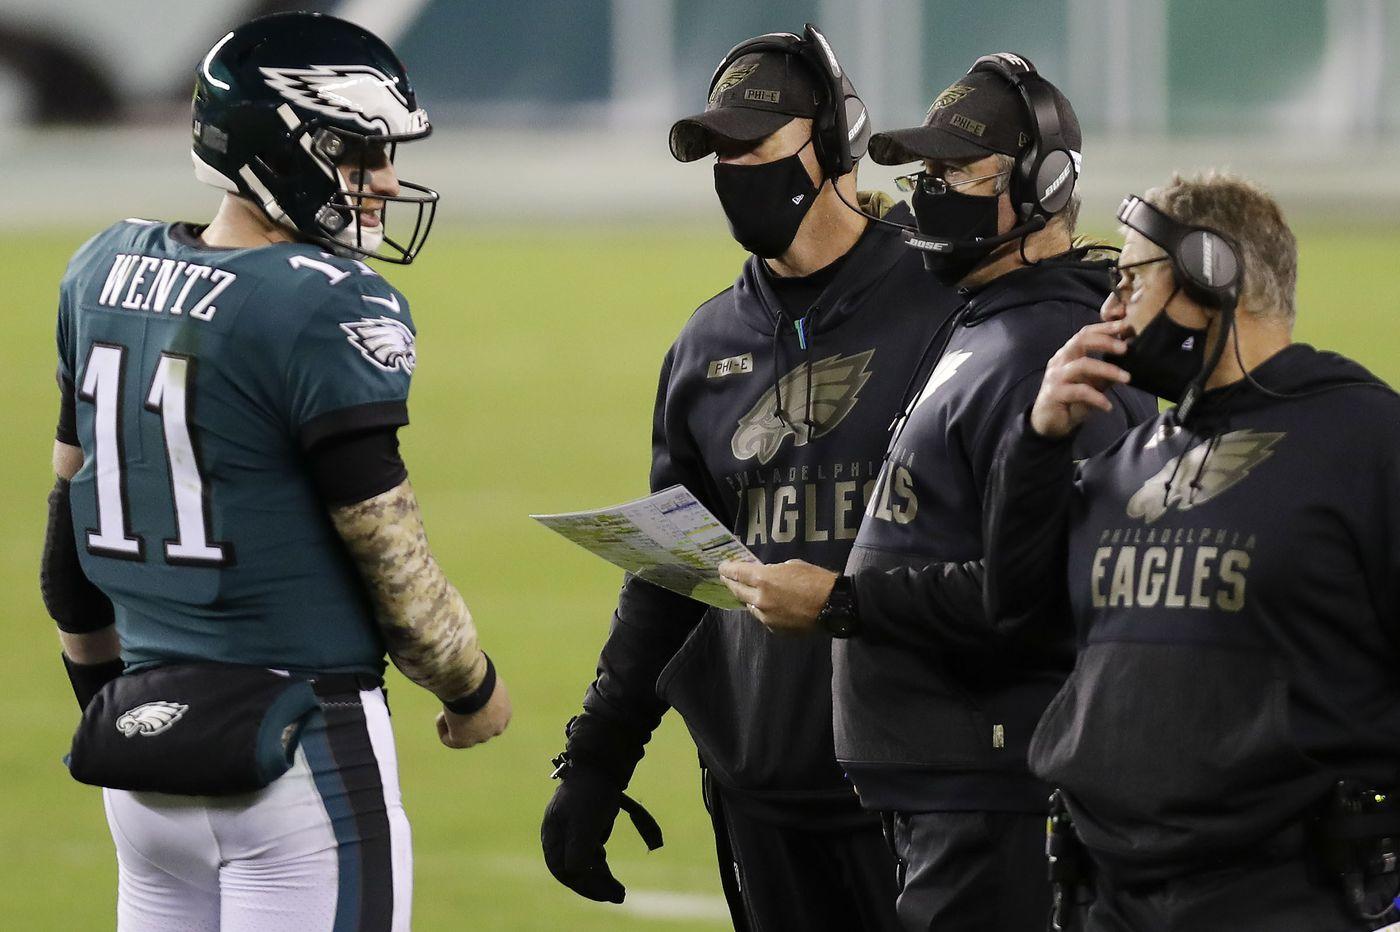 Doug Pederson's book holds the key to how he'll handle Carson Wentz and the Eagles' season | Mike Sielski